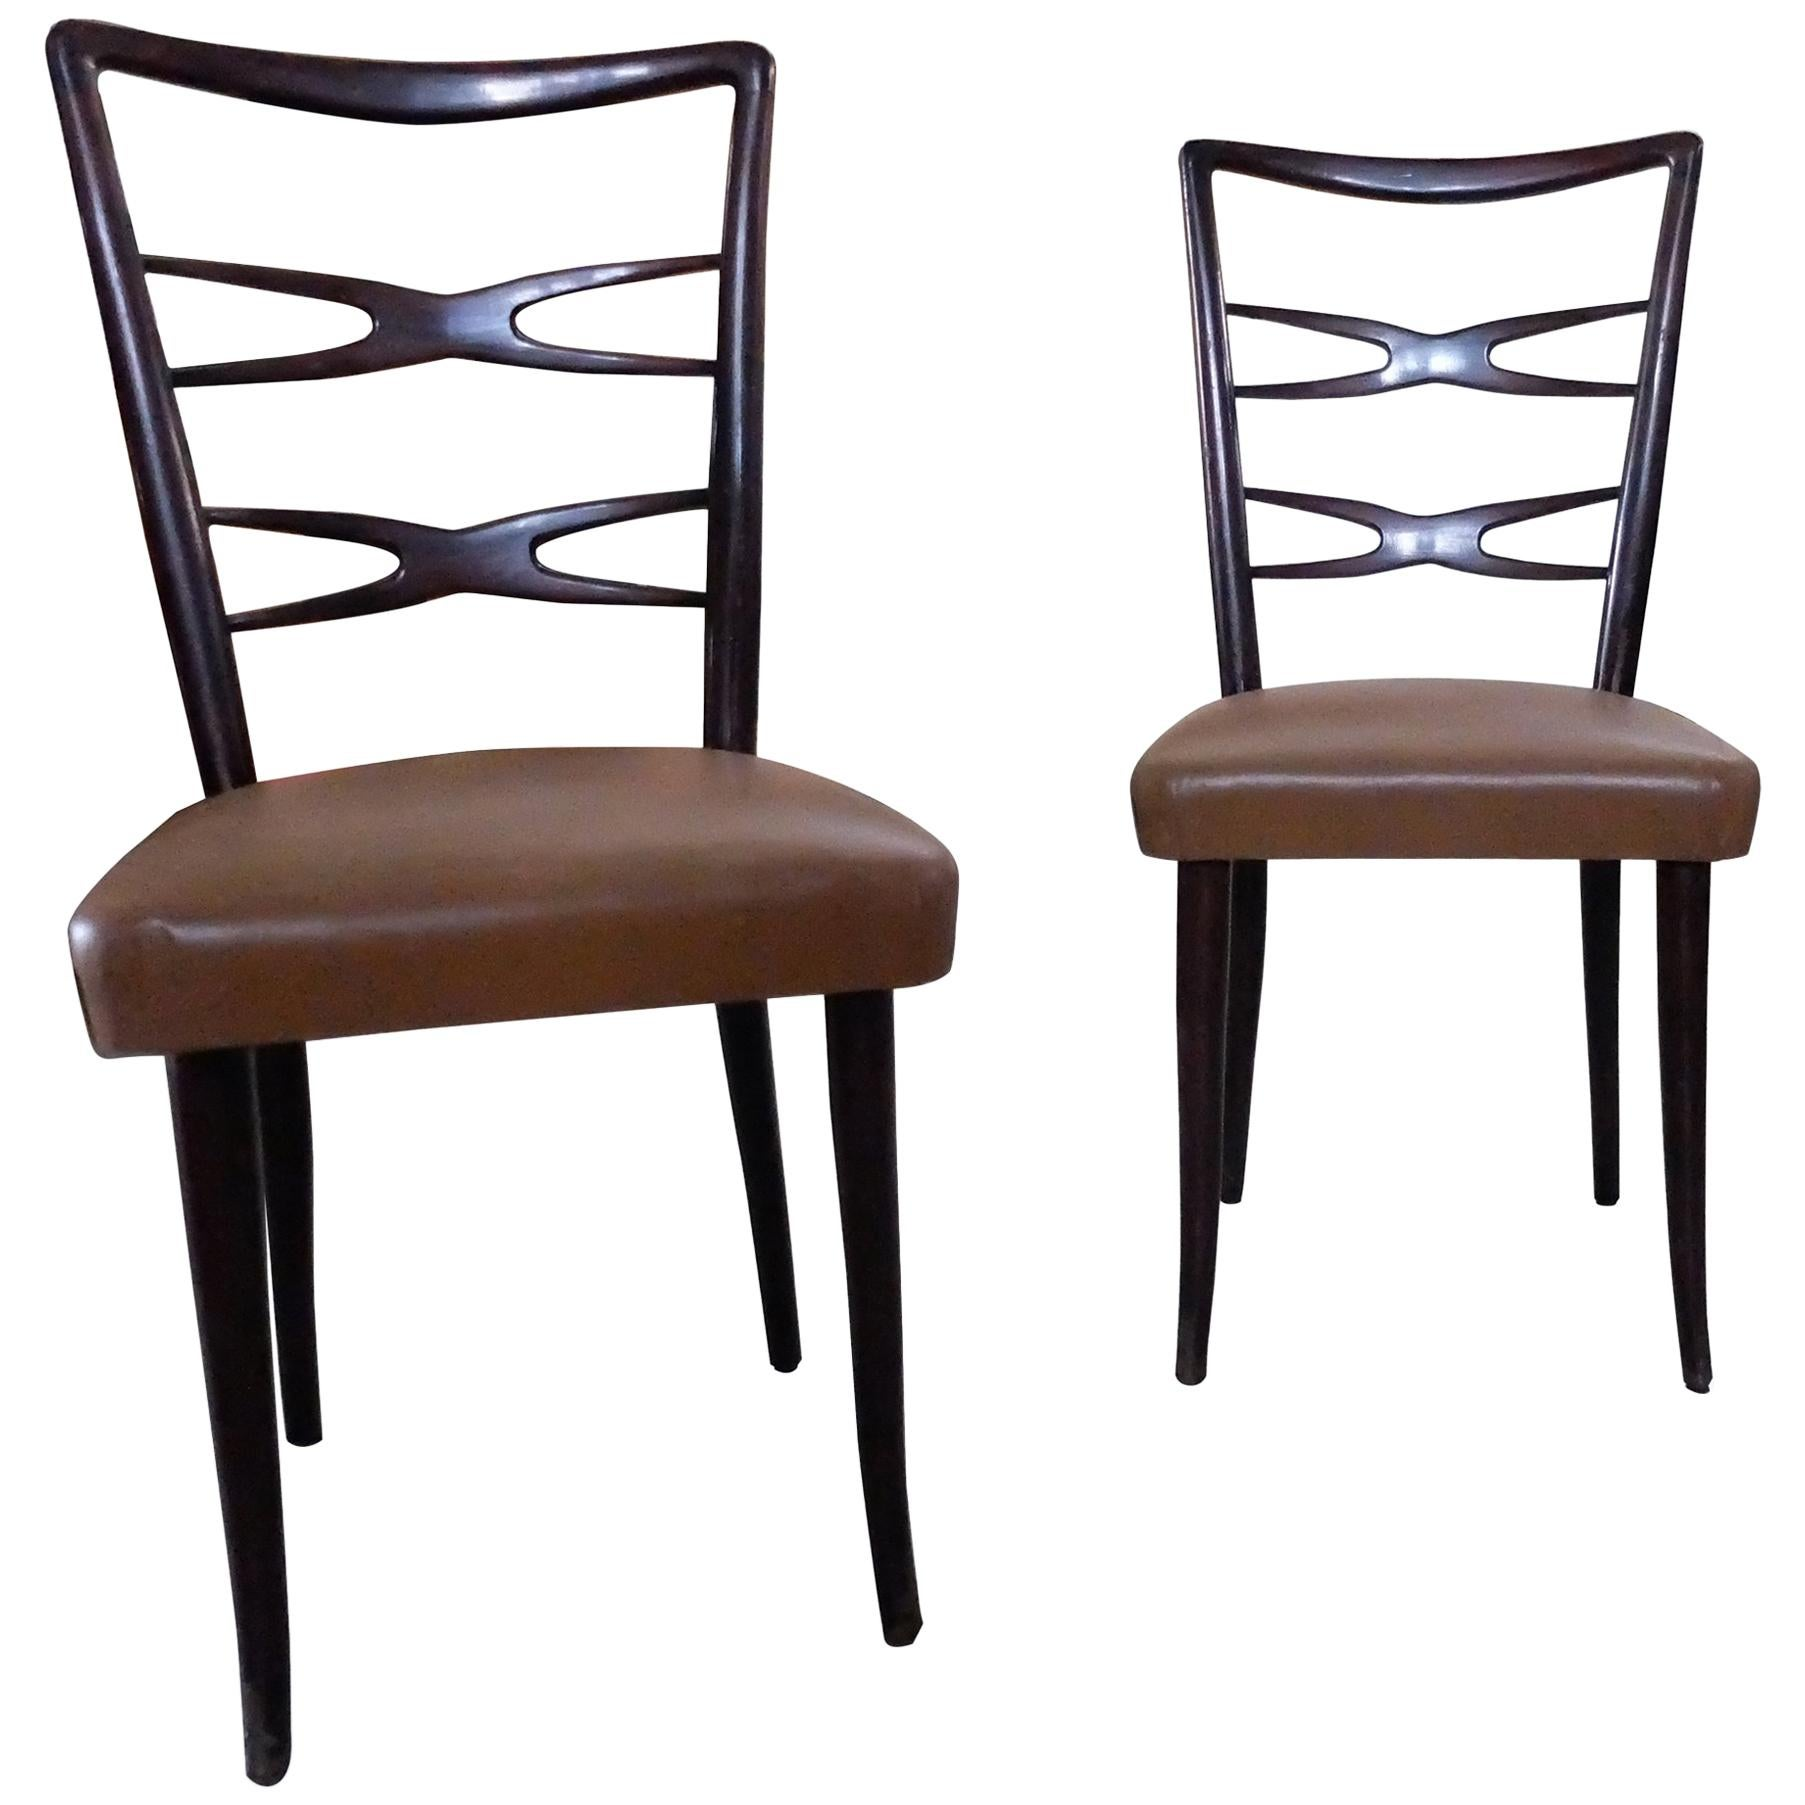 Guglielmo Ulrich, Italian Mid-Century Modern Set of 6 Chairs, 1940s